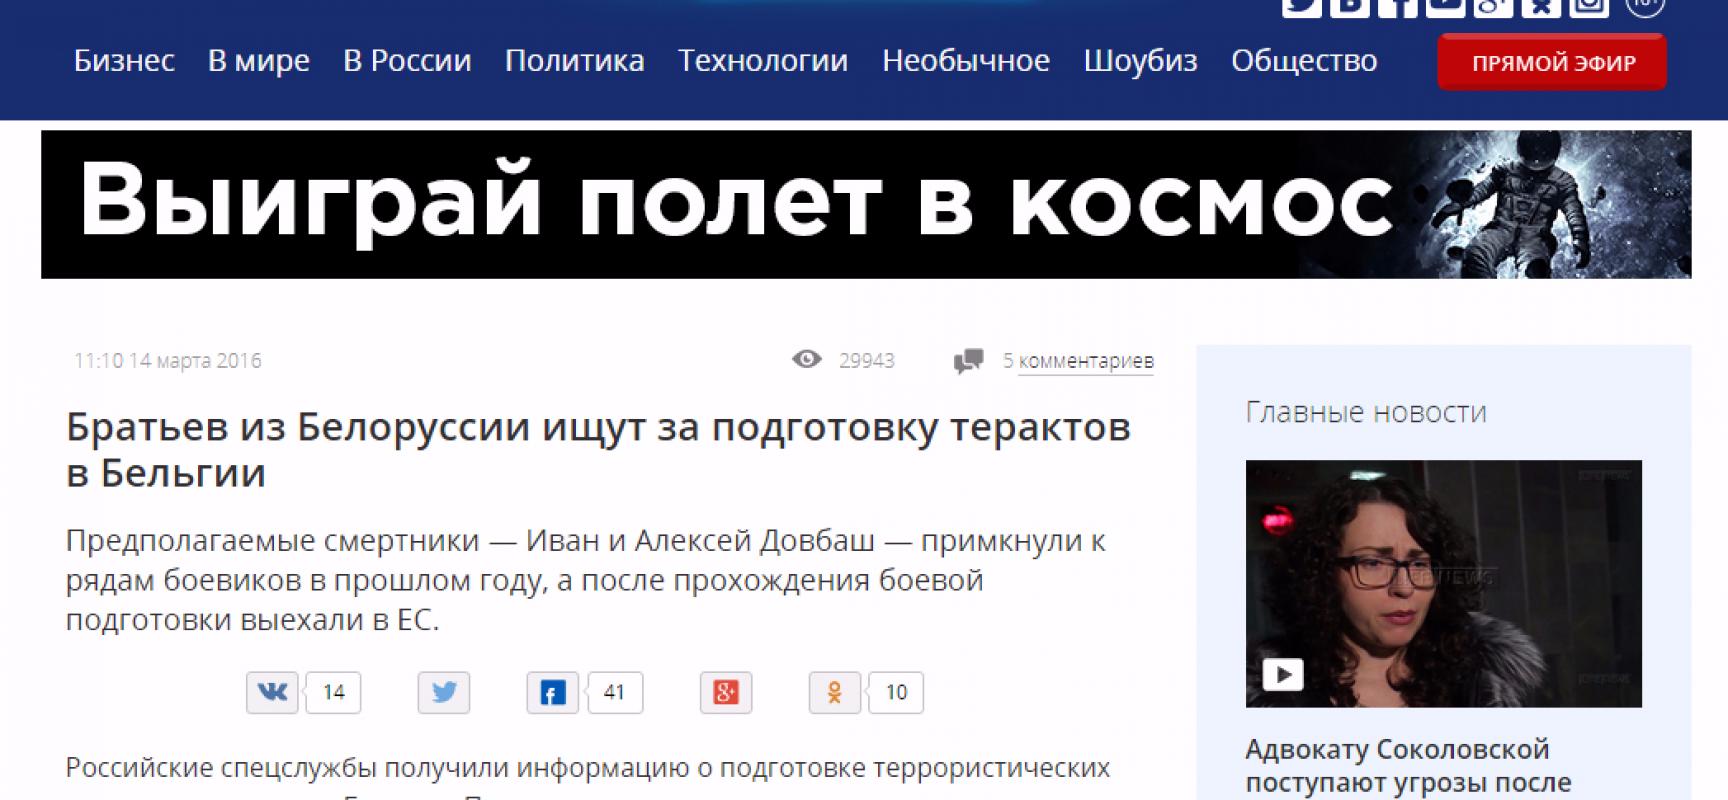 Fake: I mass media russi accusano due fratelli bielorussi per gli attentati di Bruxelles